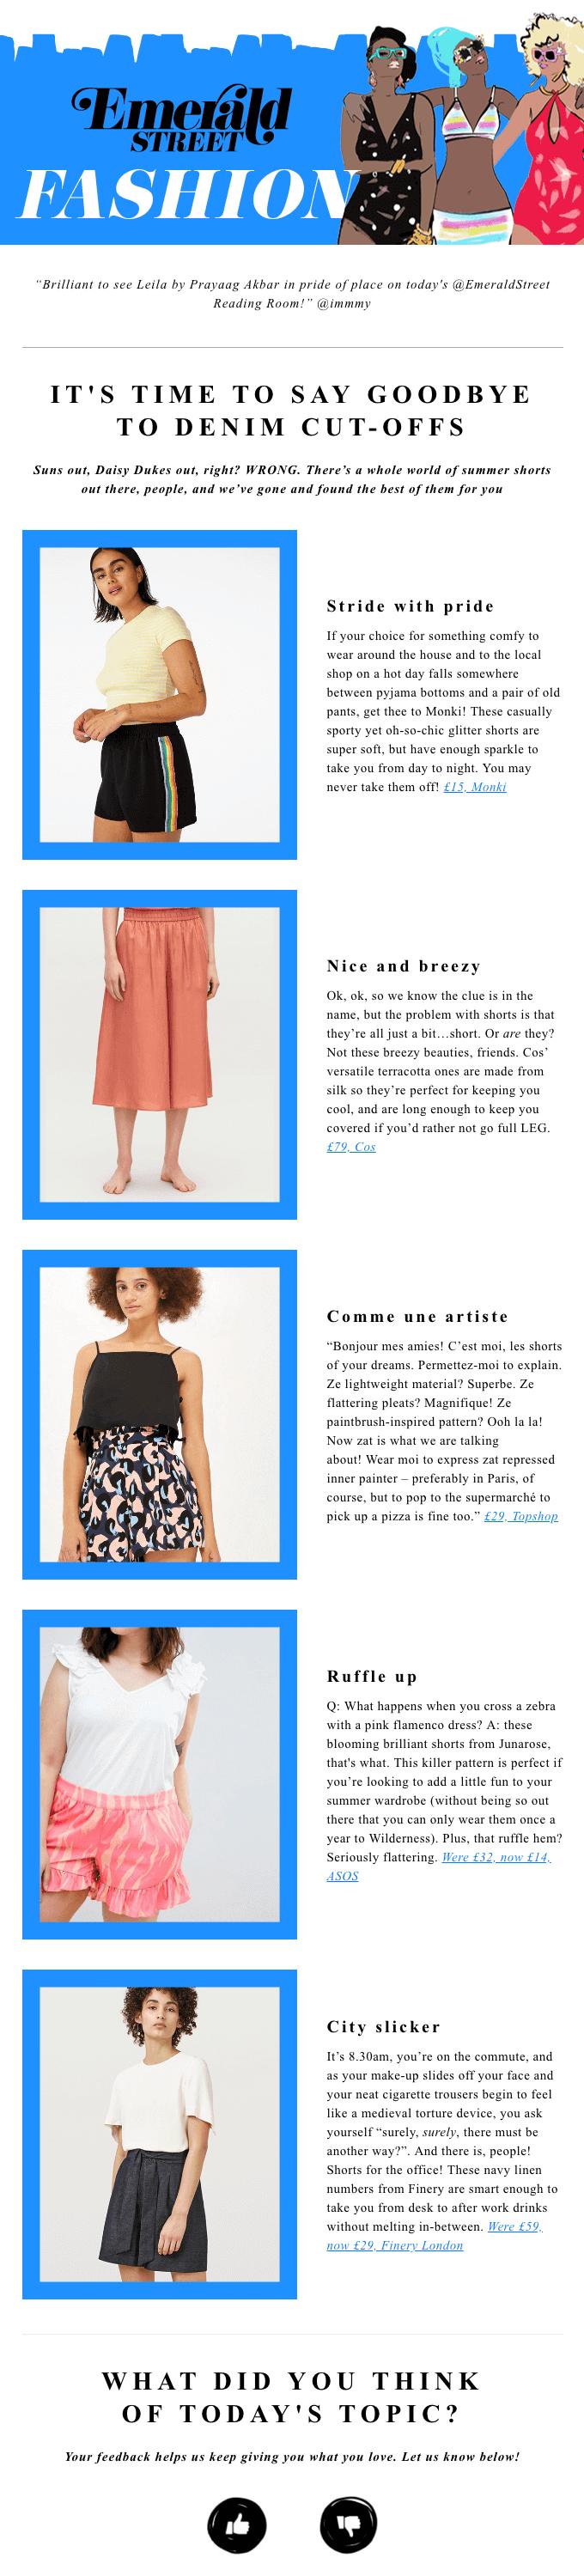 hasta-la-vista-daisy-dukes-email-newsletter-examples